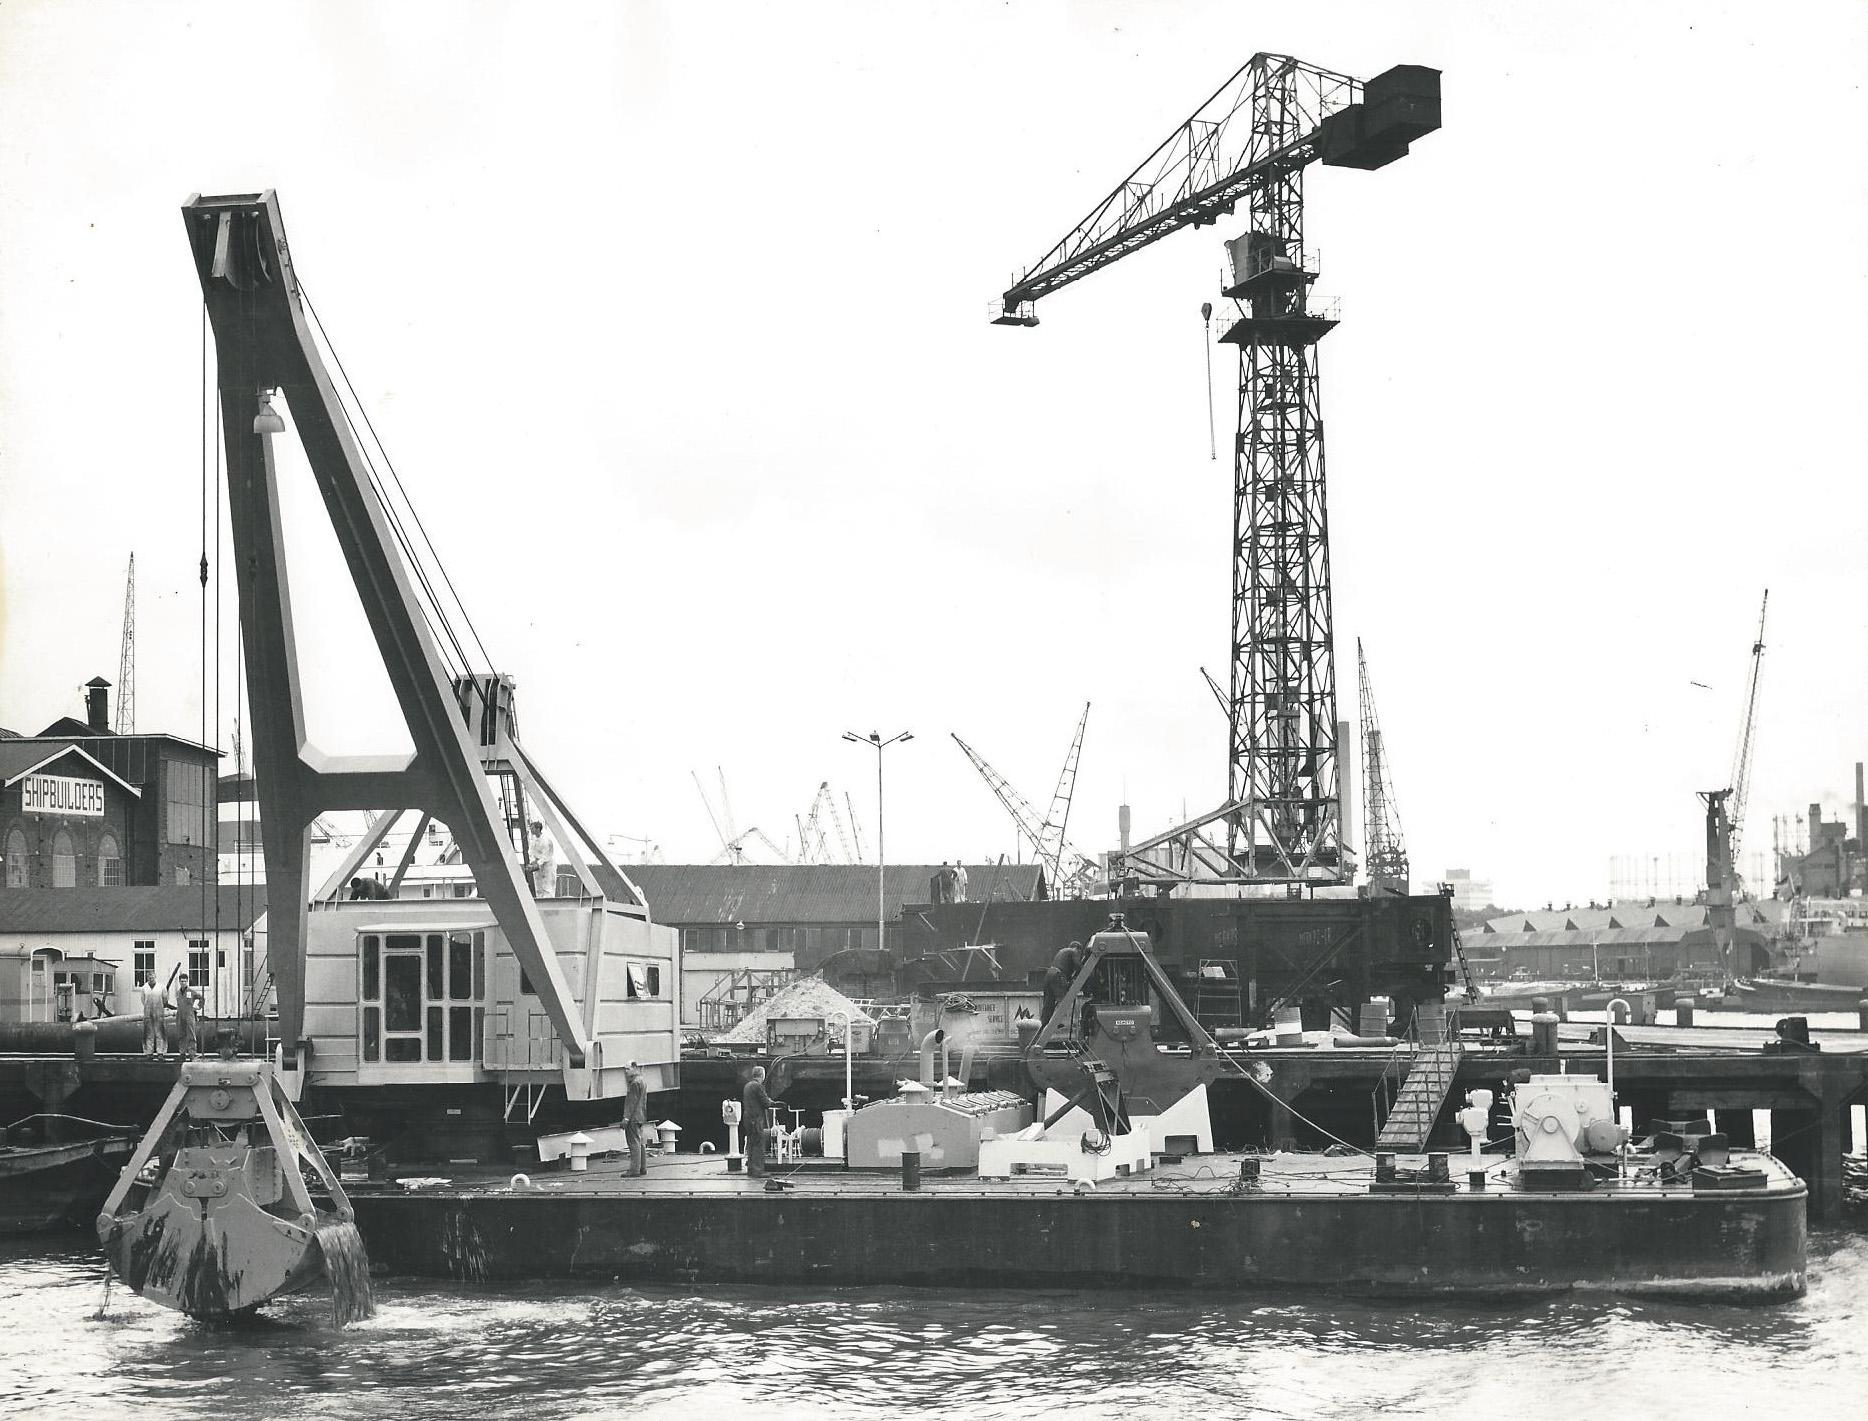 Co. 1126: Nathalie (1966)